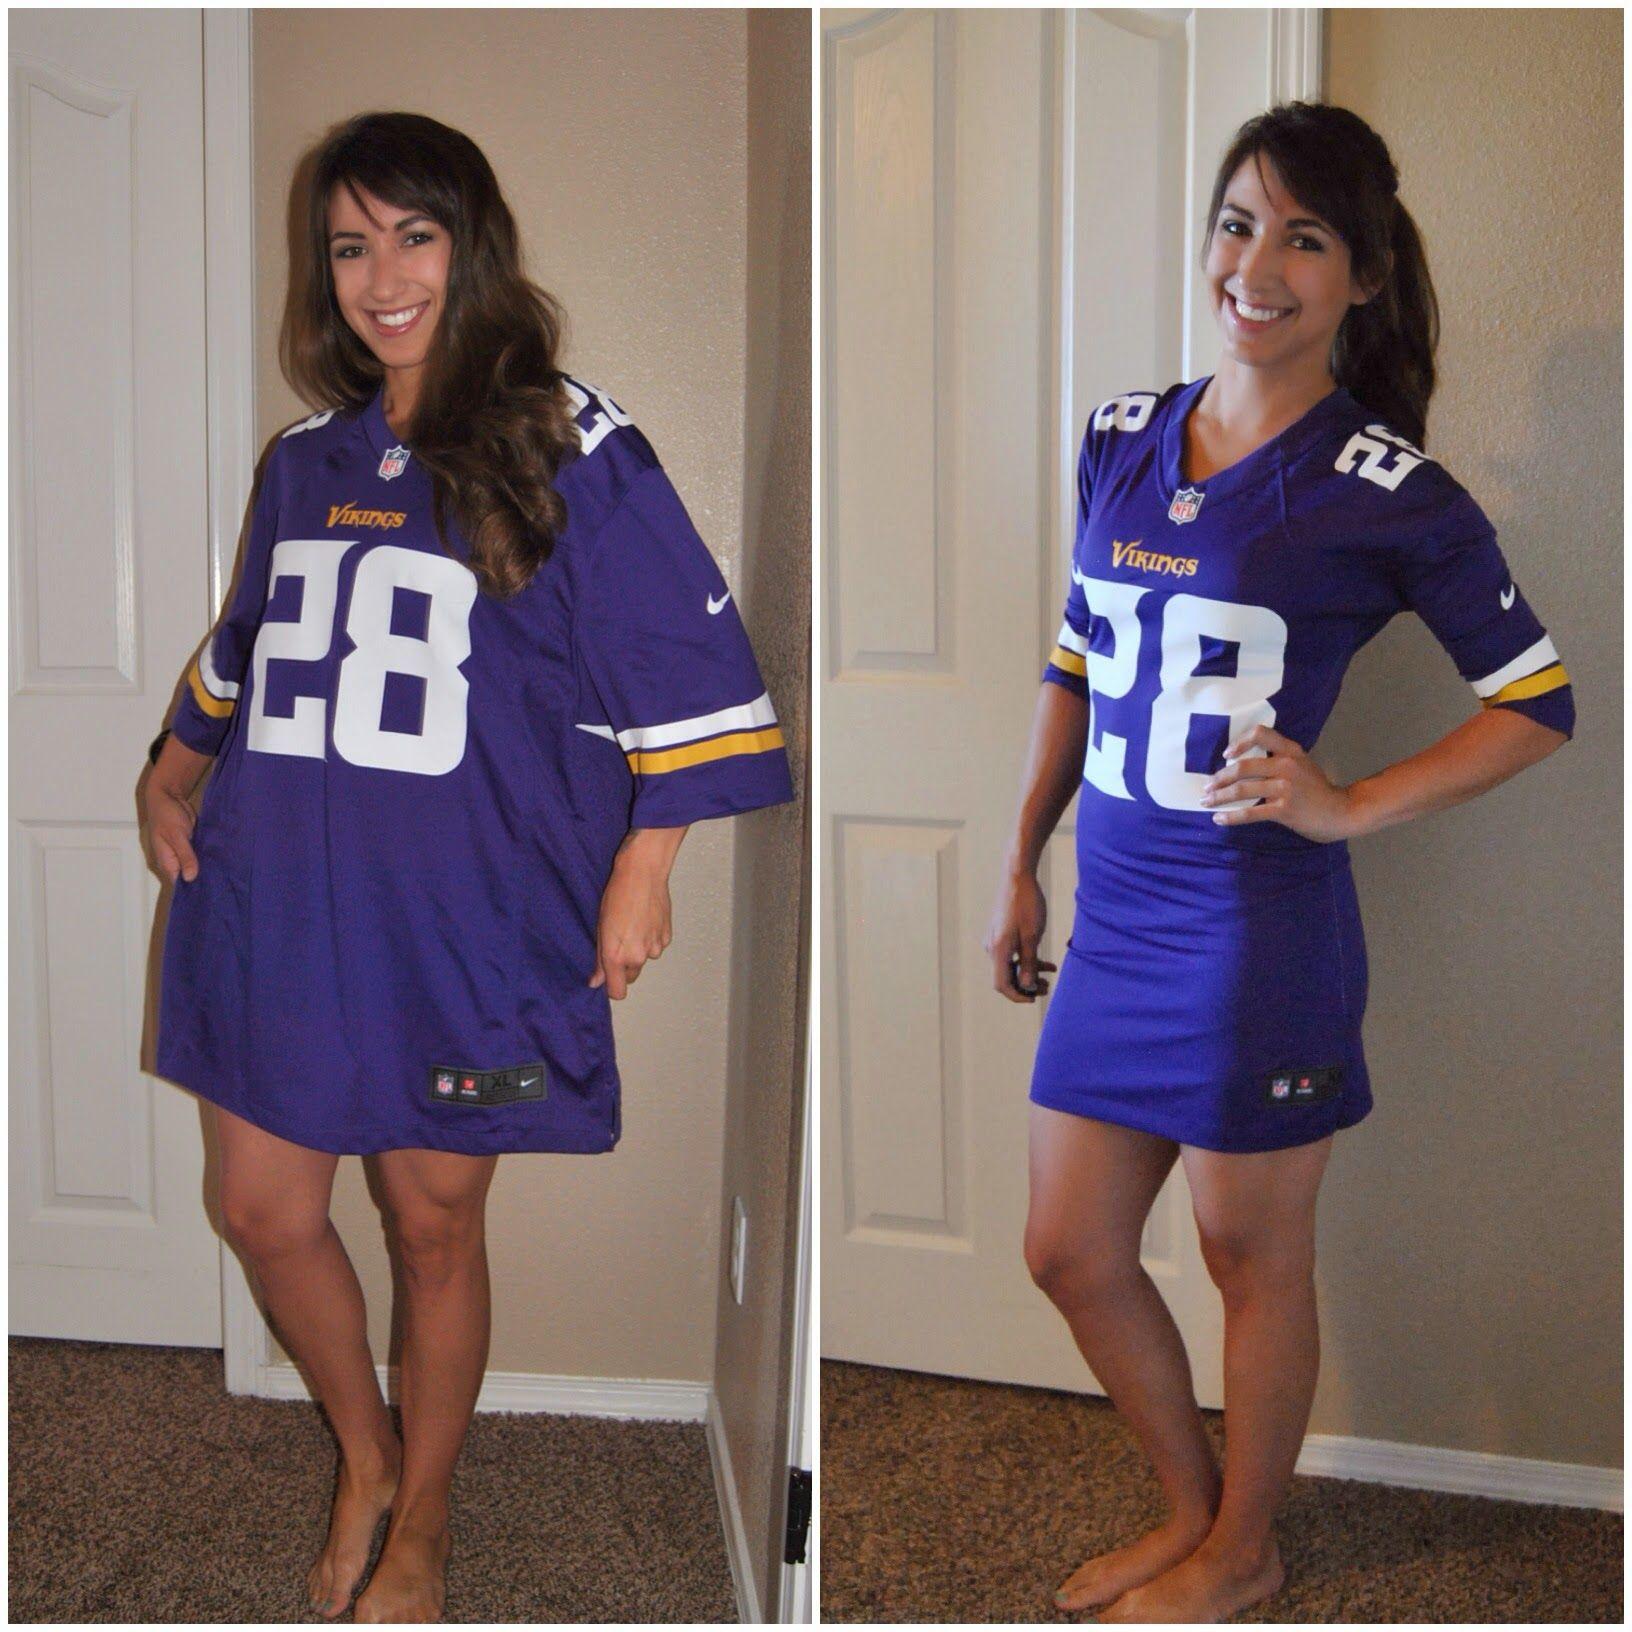 329dd202c84 Sew Much More than Rubies: Football Jerseys: For girls!! Football Jersey  Dress